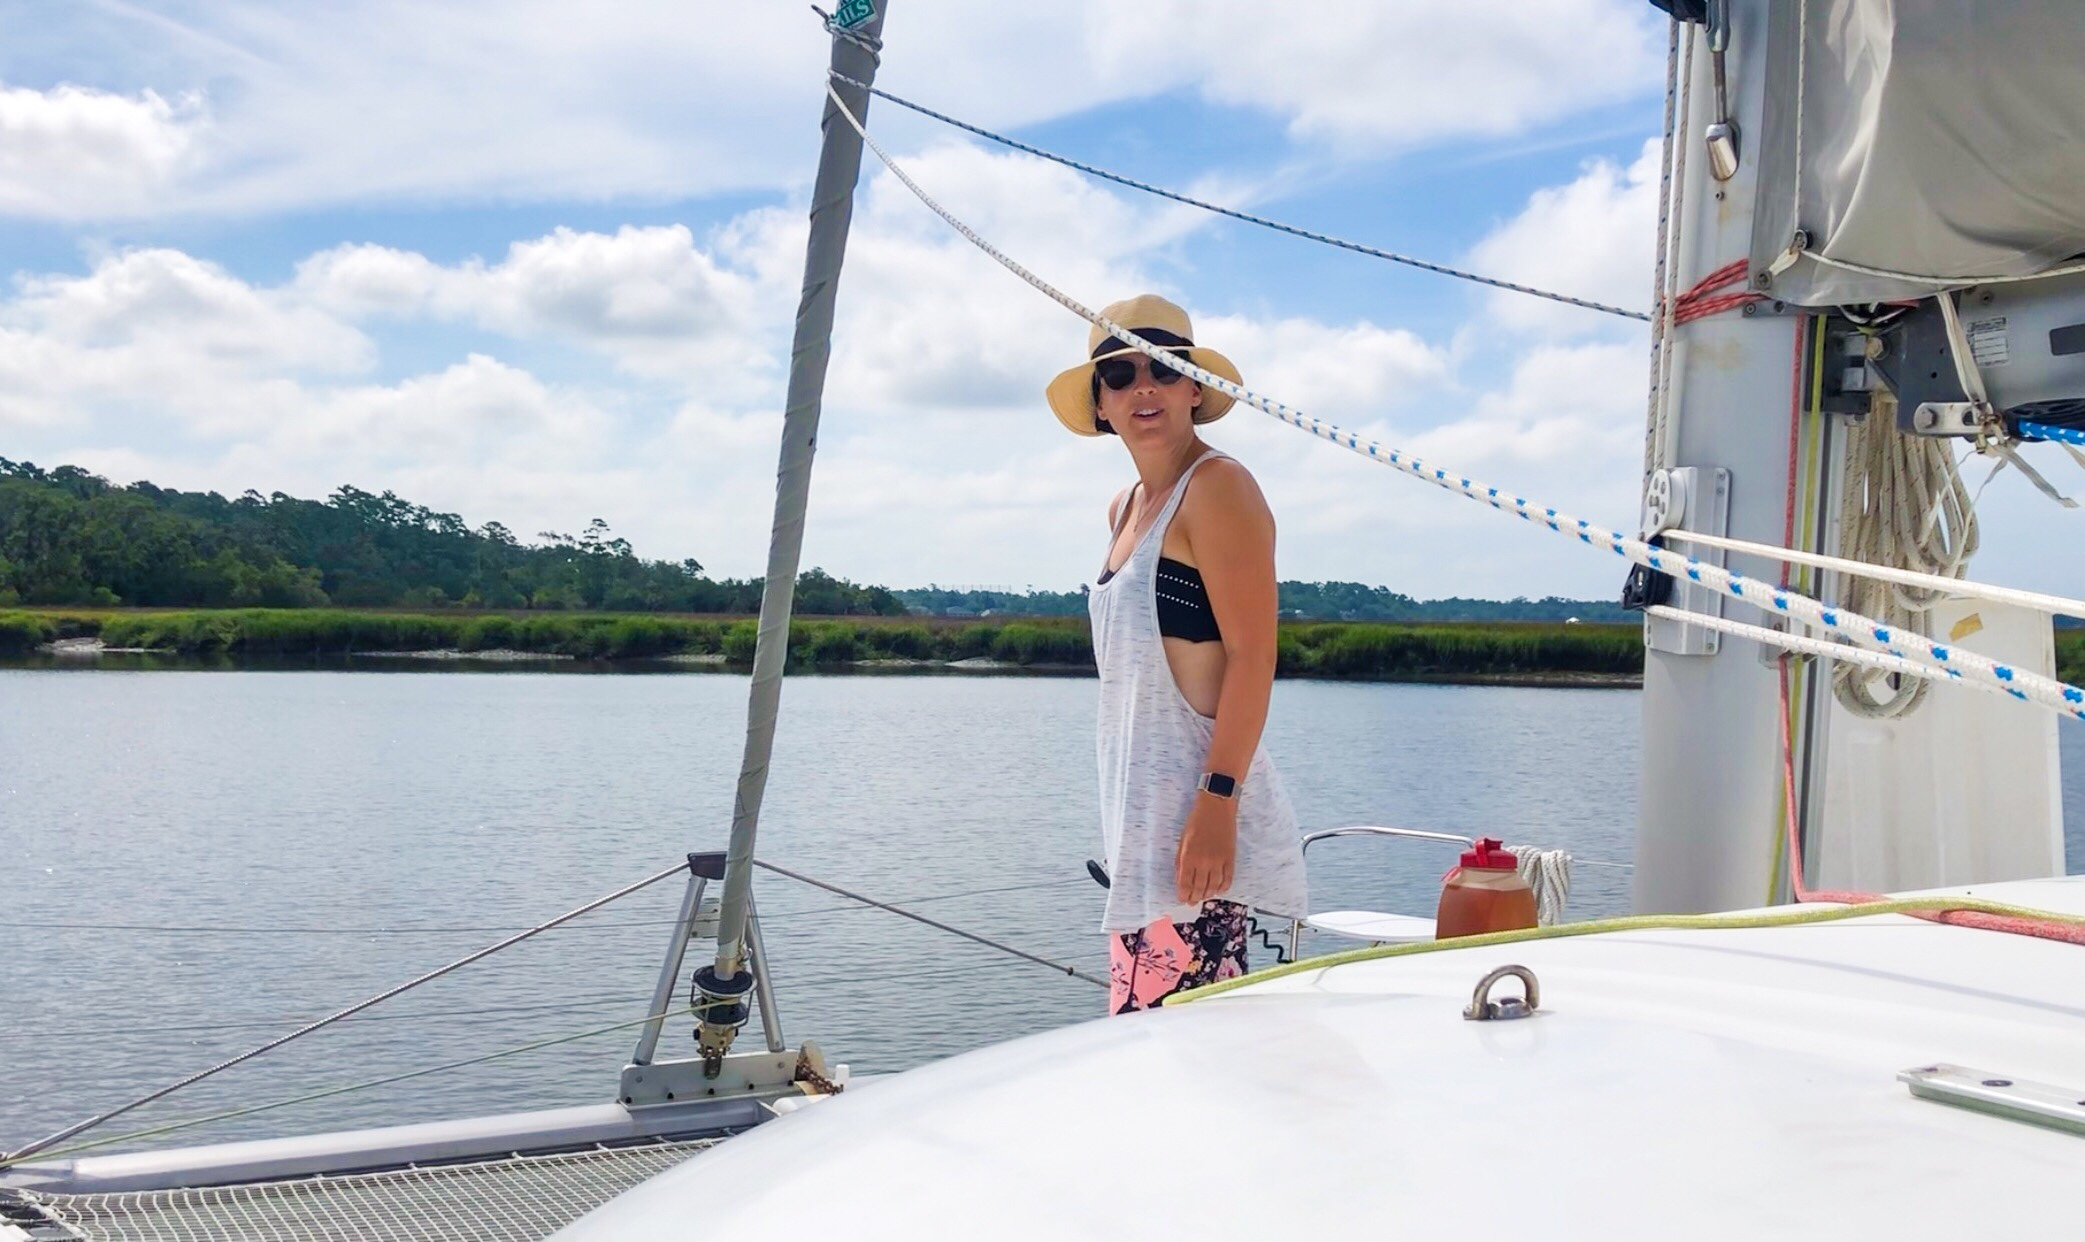 wardrobe-choices-on-a-boat.jpeg